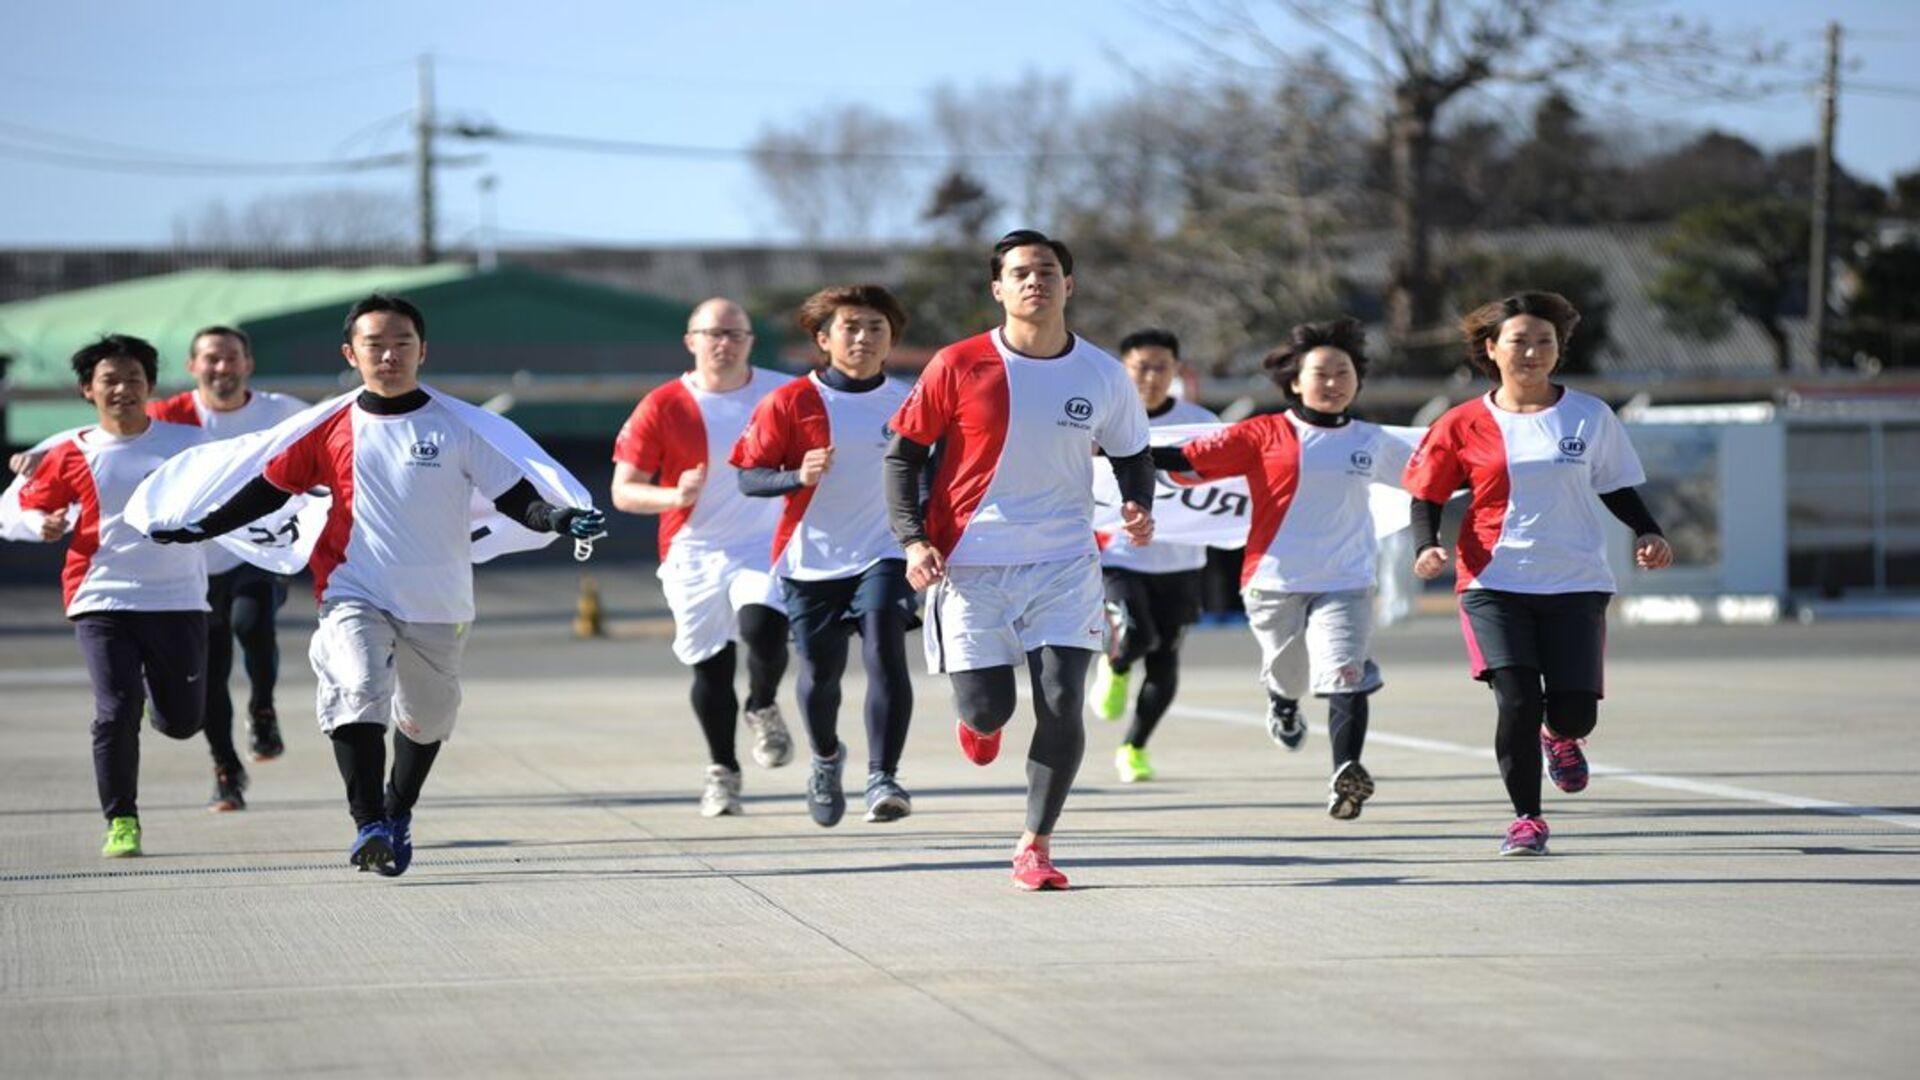 March 5km UD Run - UD Virtual Challenger Run 2021